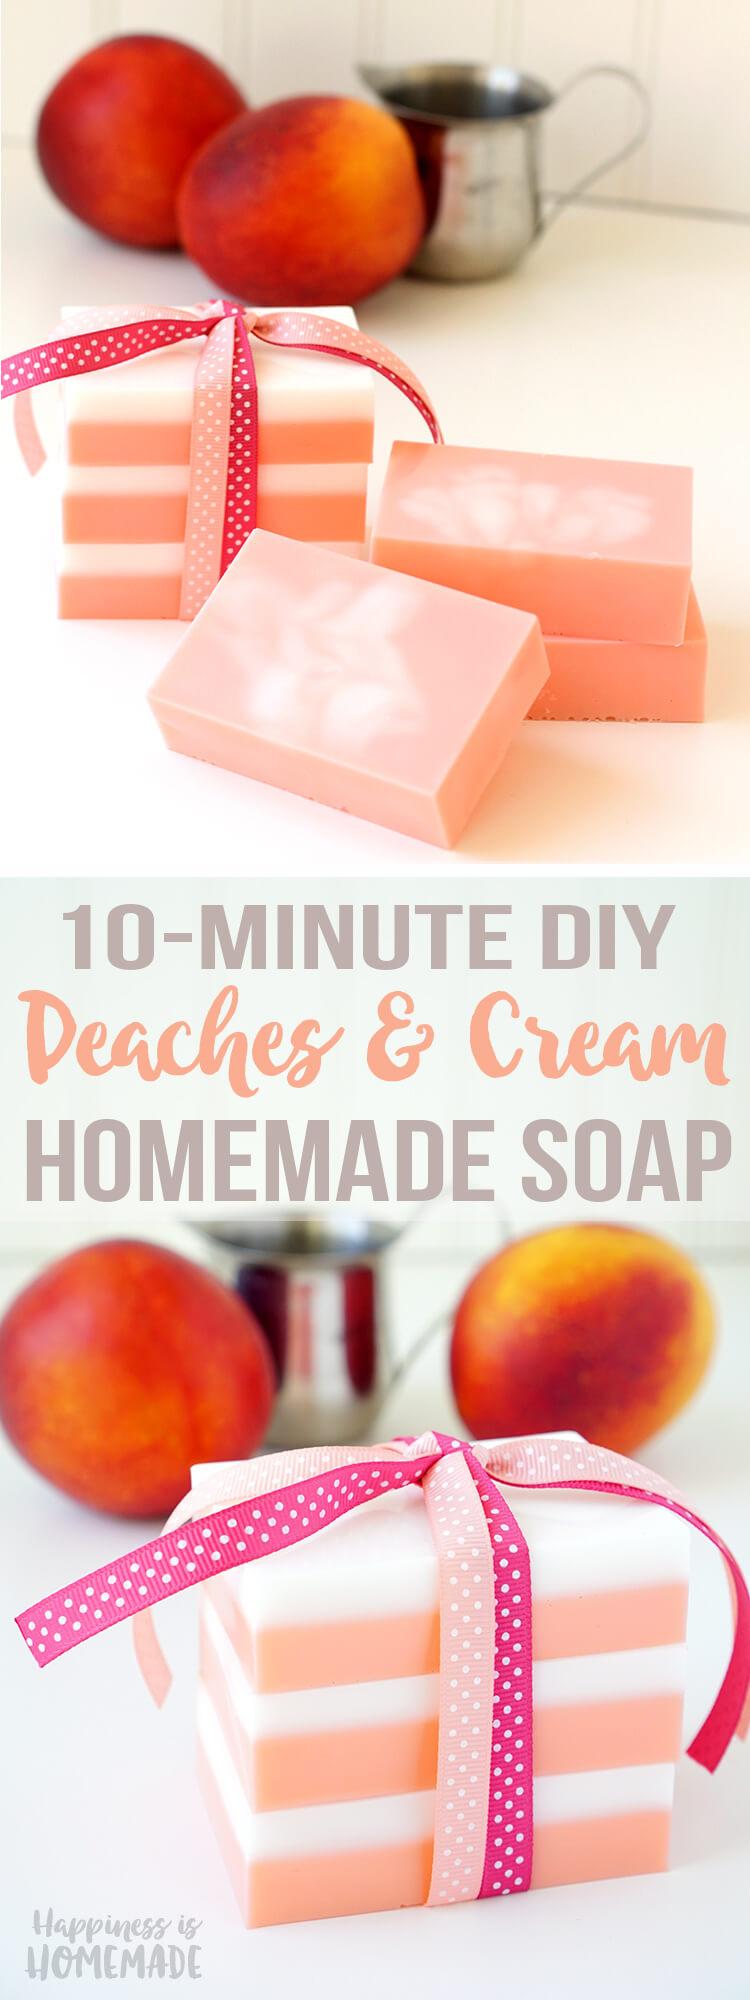 10 Minute DIY Peaches and Cream Soap - Easy Homemade Gift Idea